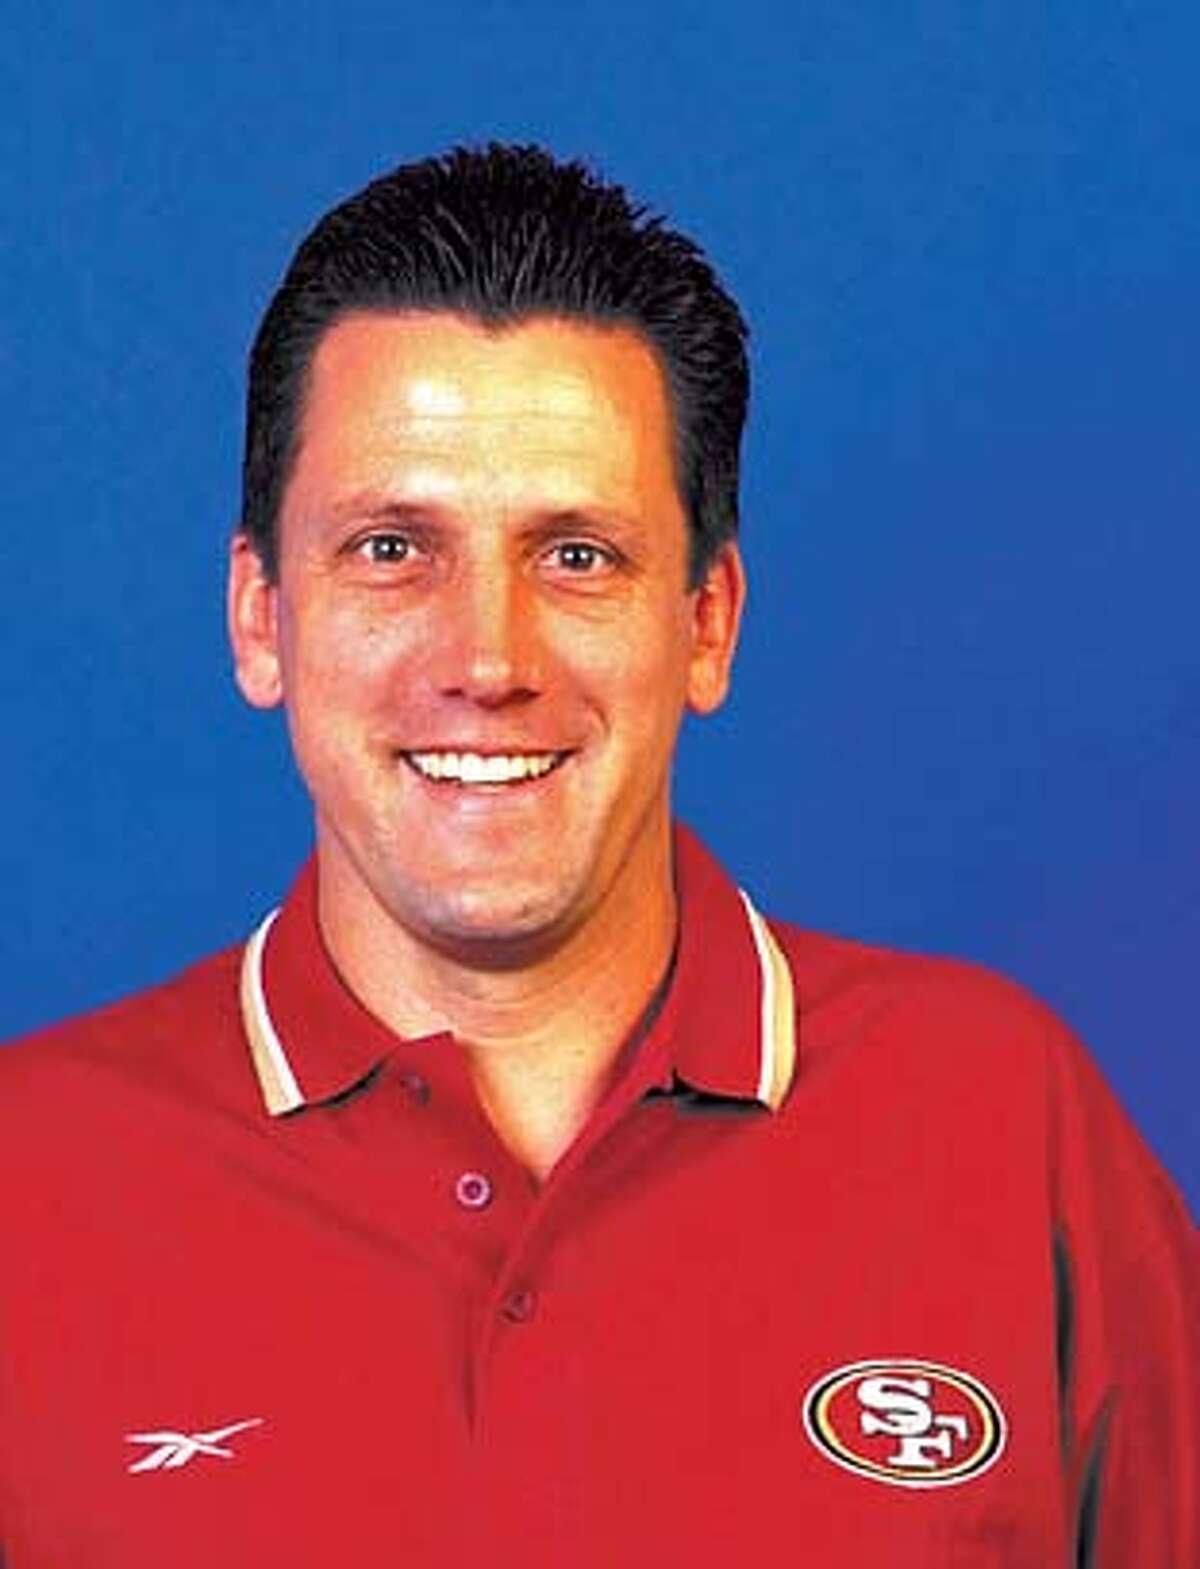 Gregg Knapp, 49ers offensive coordinator. handout from niner's organization. Greg Knapp Greg Knapp